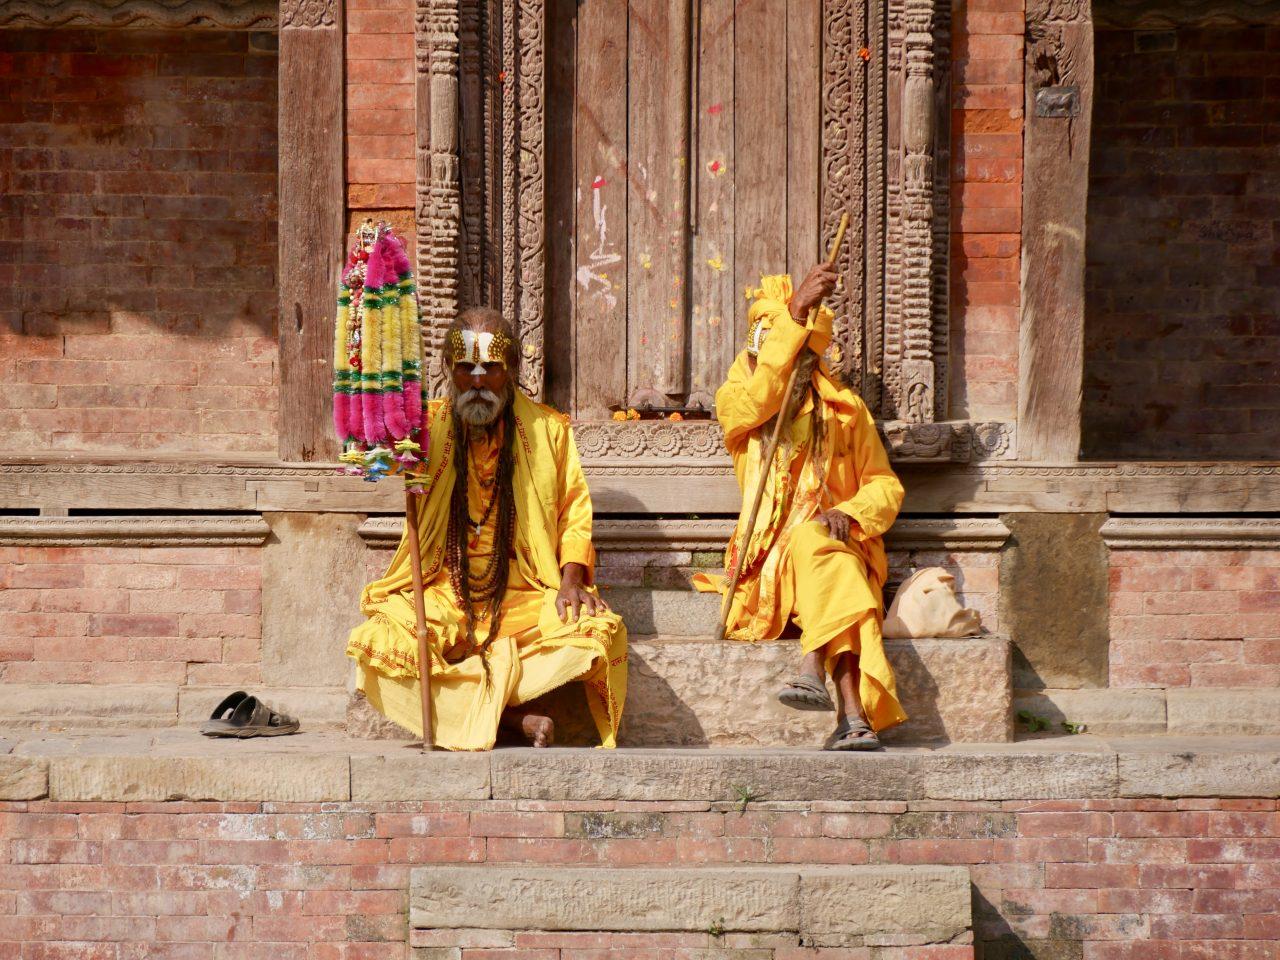 Bettelmönche, Durbar Square, Kathmandu, Nepal